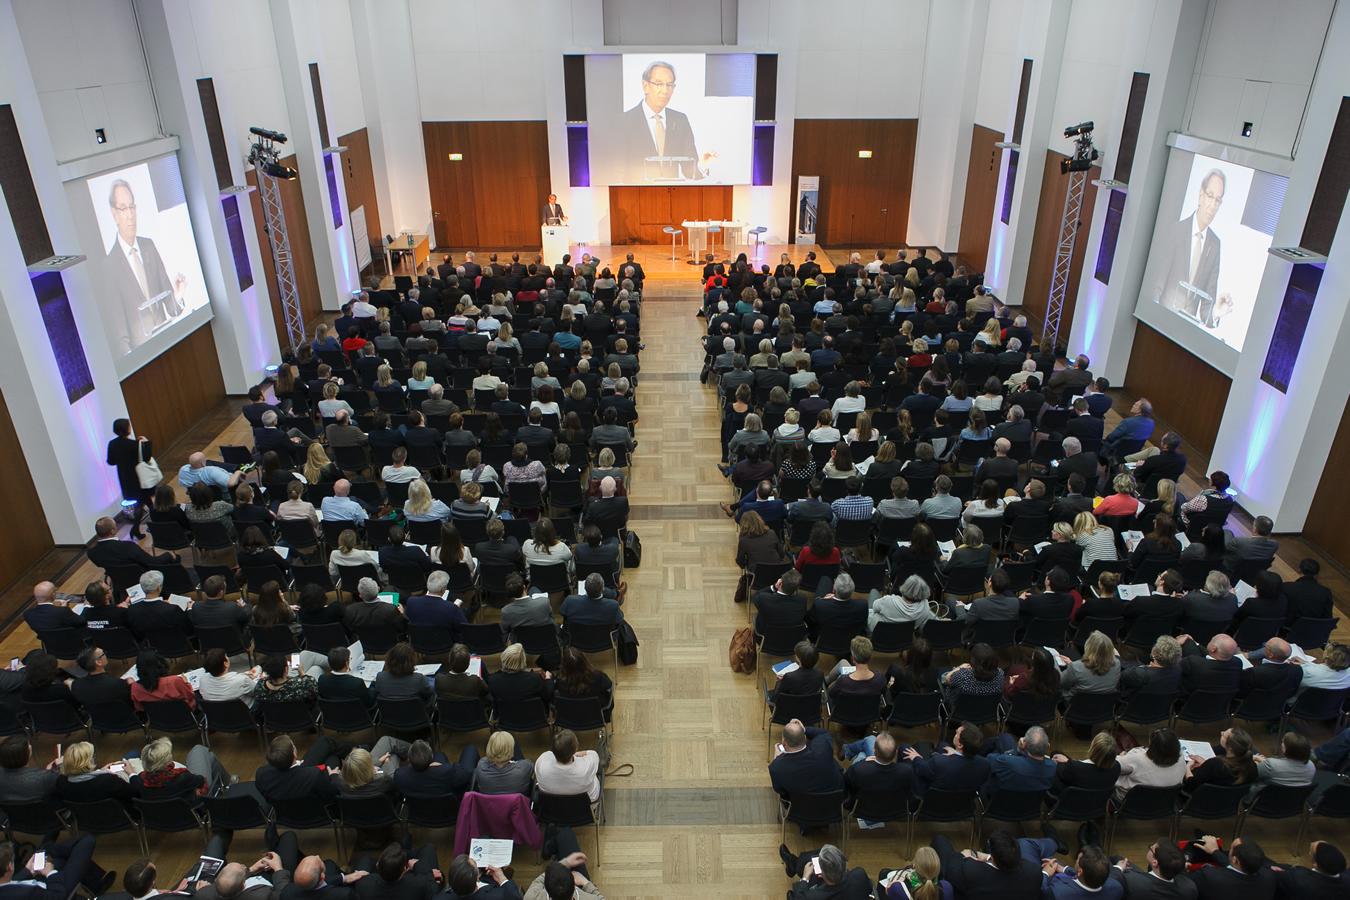 Plenarsaal mit über 400 Gästen